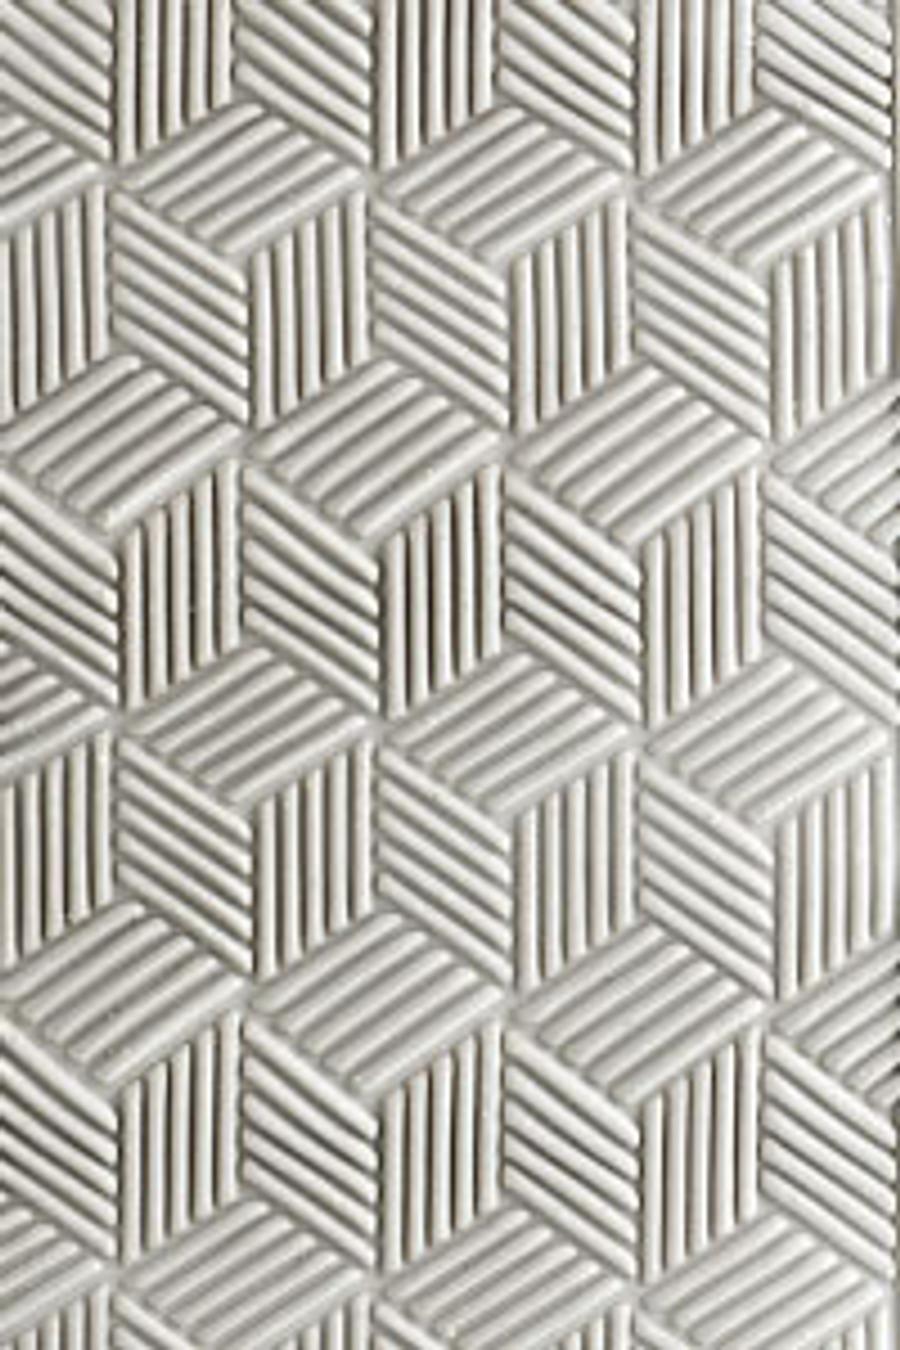 Acrylic Texture Roller - Cubic Weave 5cm